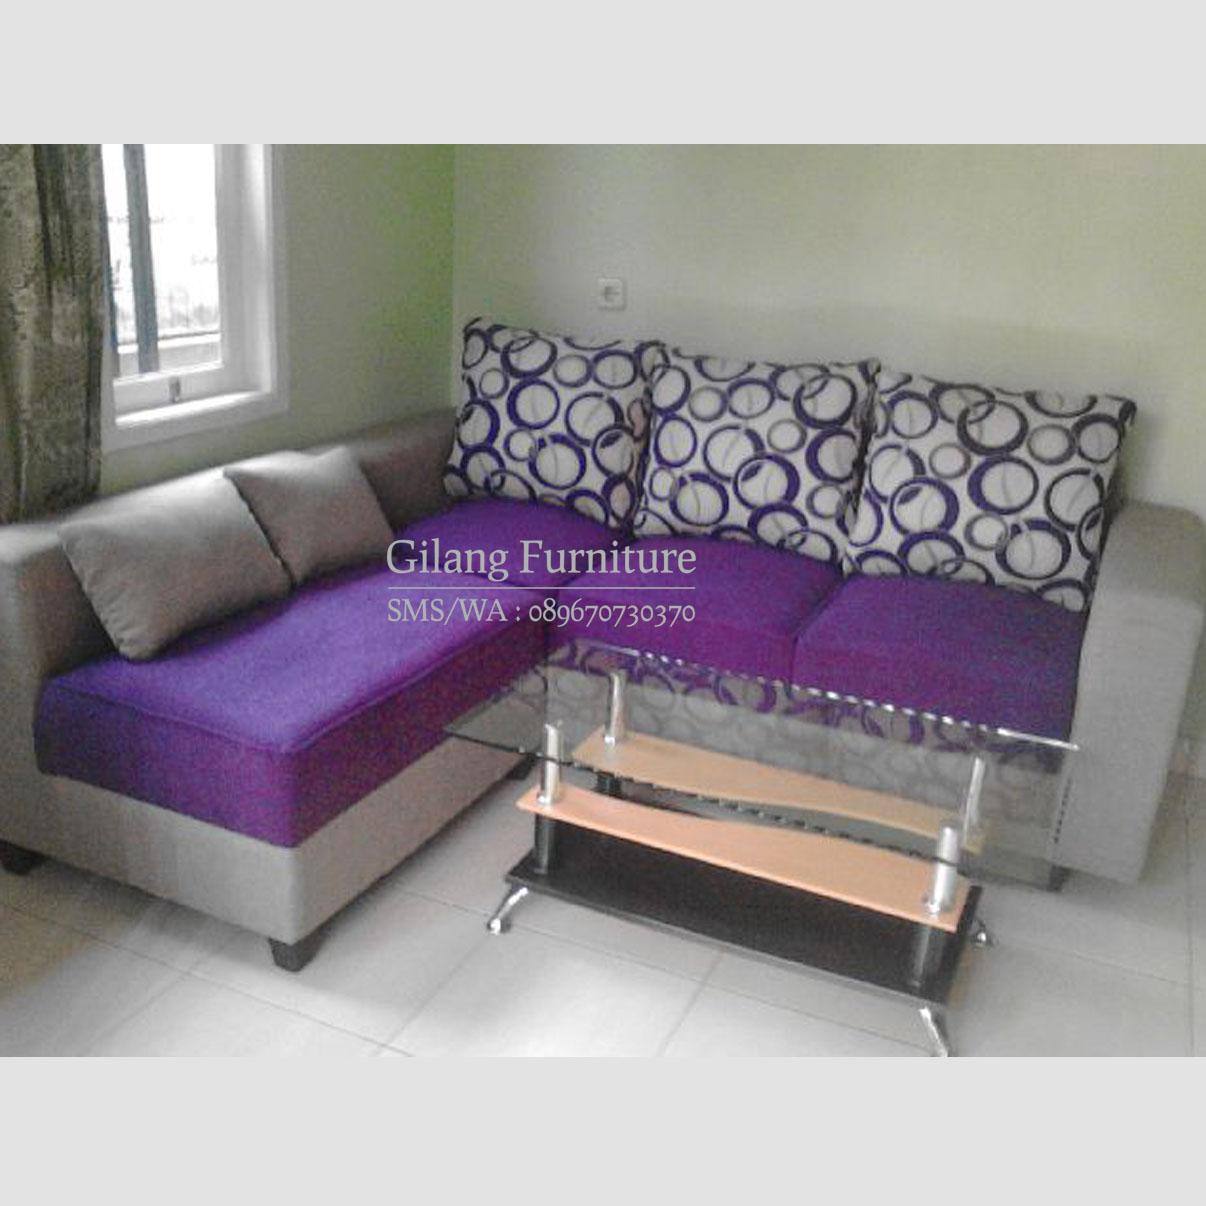 jual sofa bed murah di jakarta selatan sofas baratos madrid segunda mano reclining home theatre